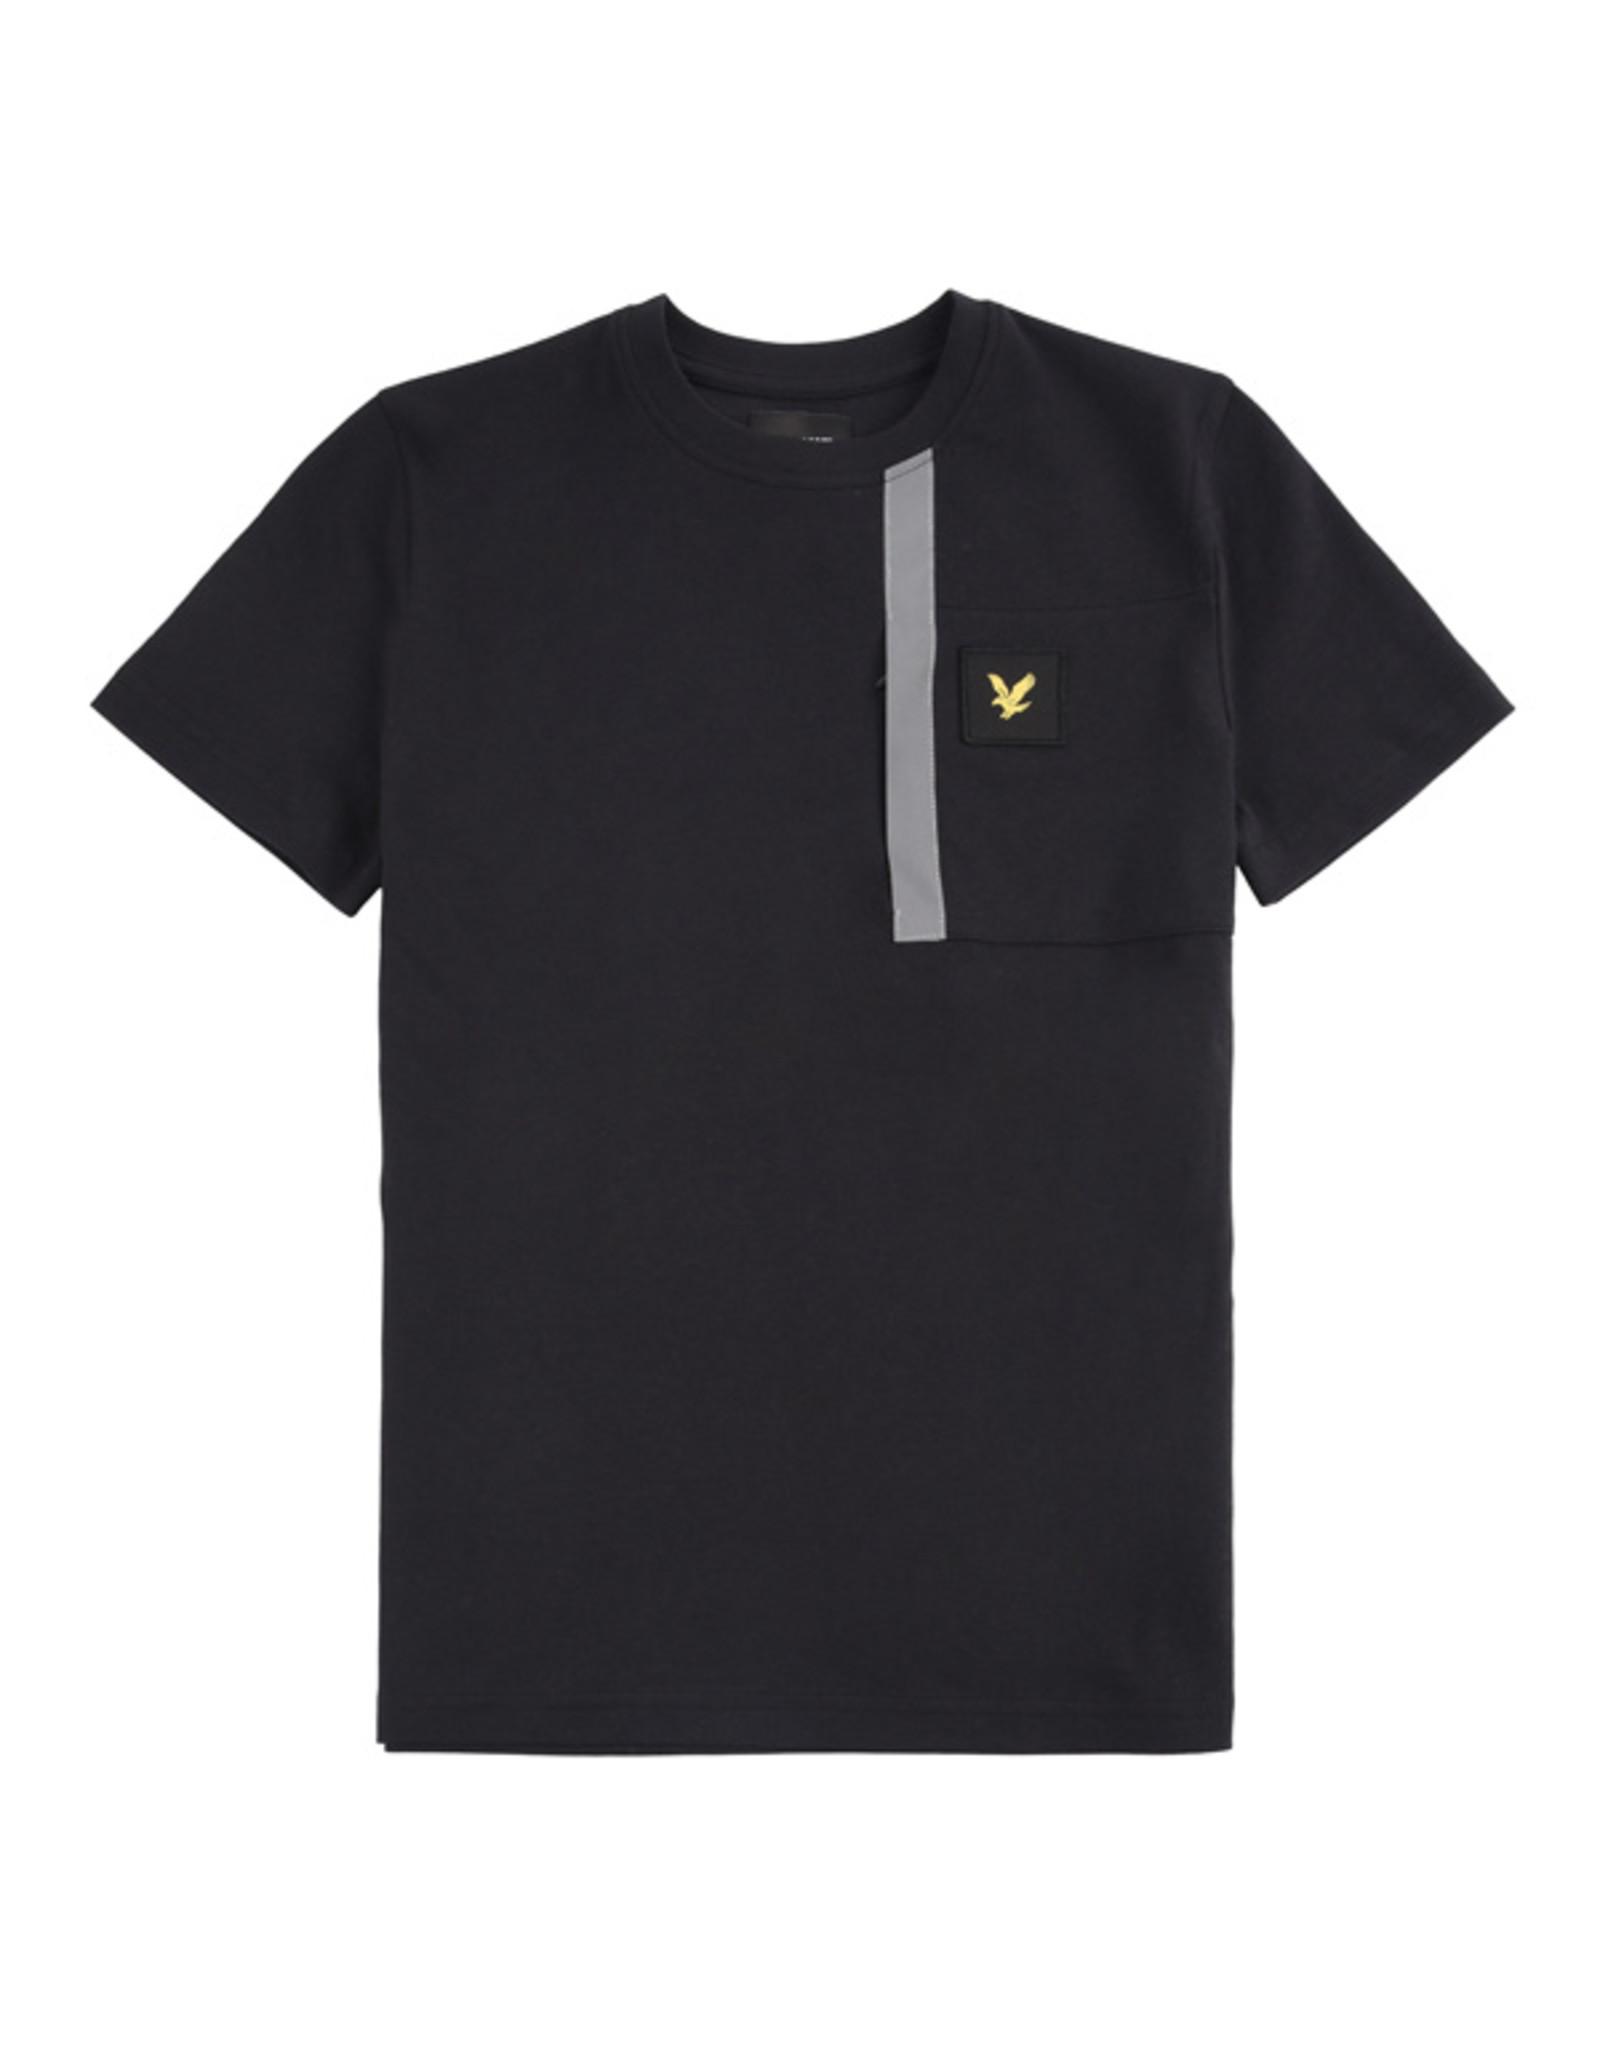 Lyle & Scott Boys Reflective Detail T Shirt Black